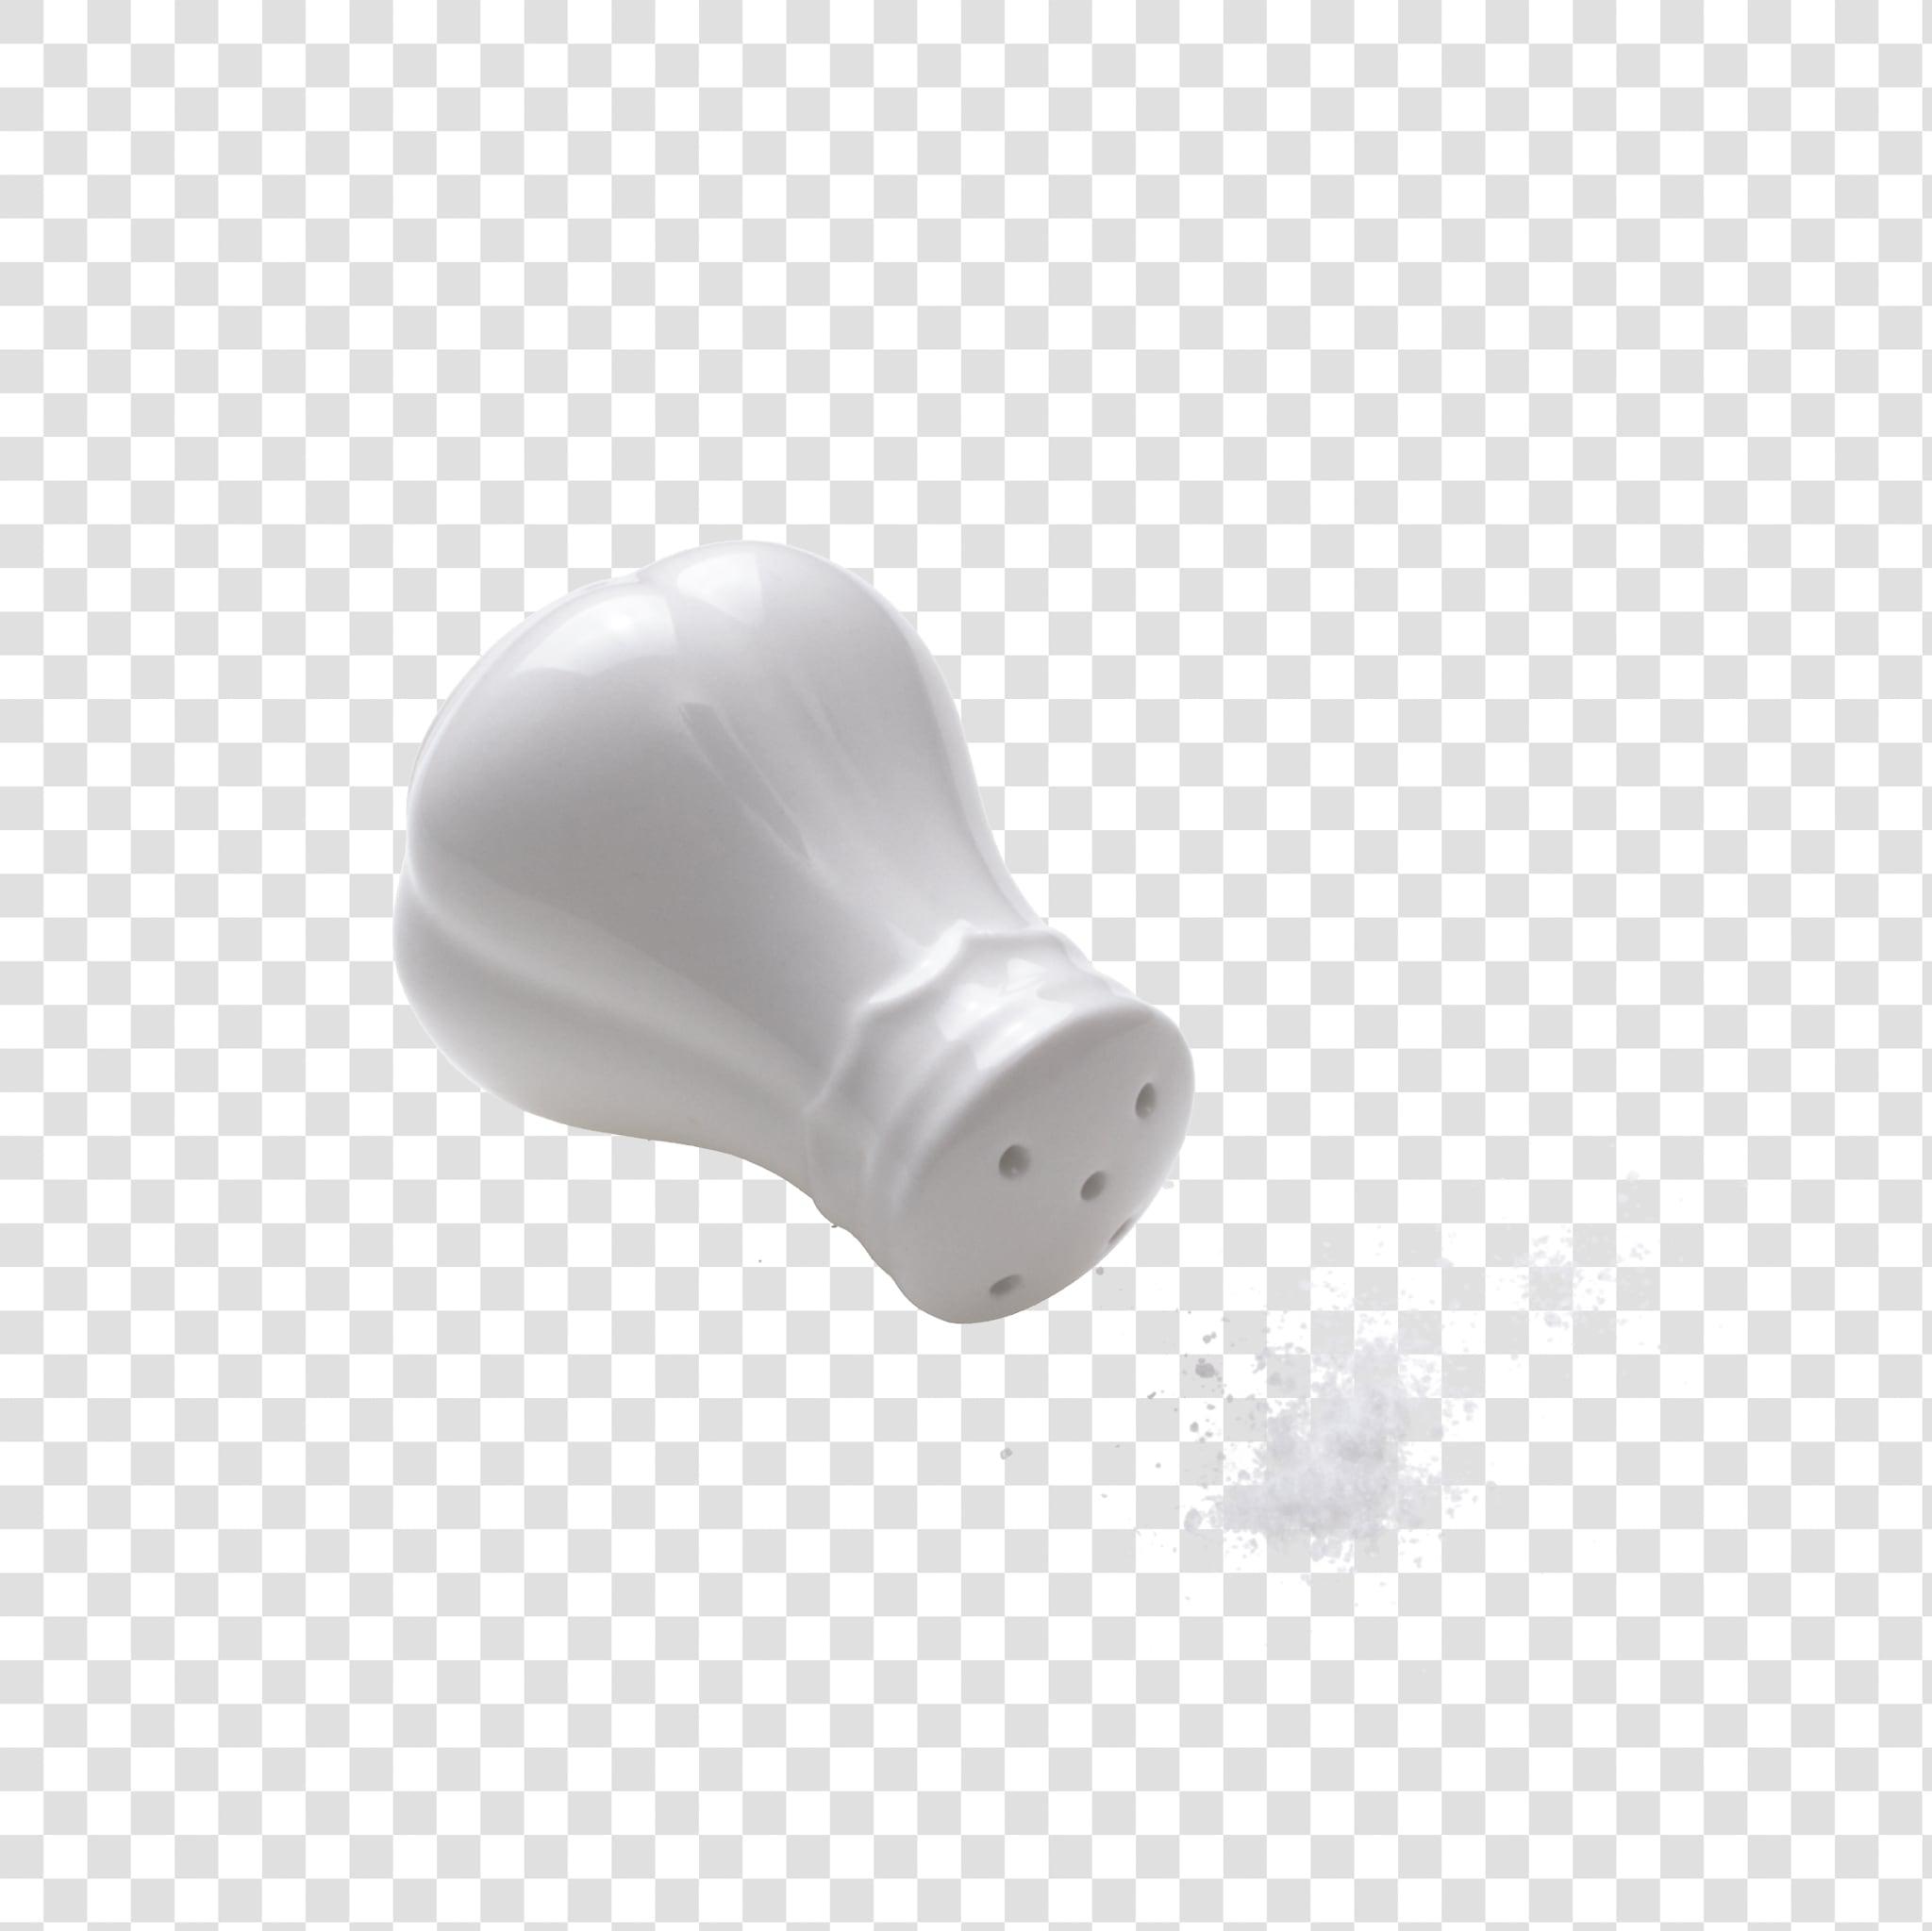 Salt shaker PSD layered image